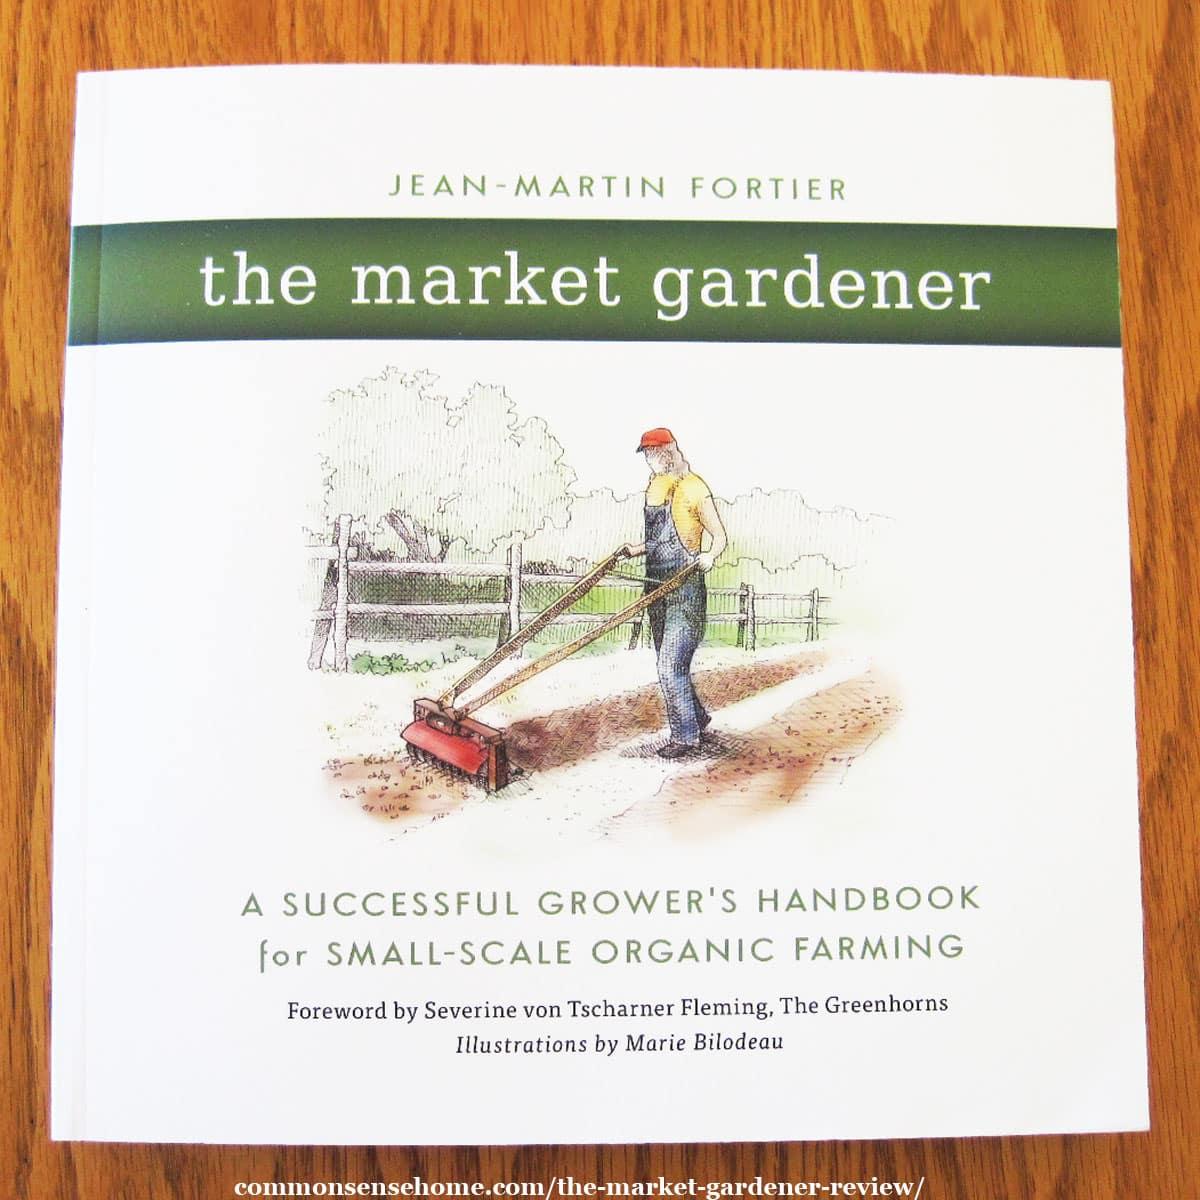 The Market Gardener book